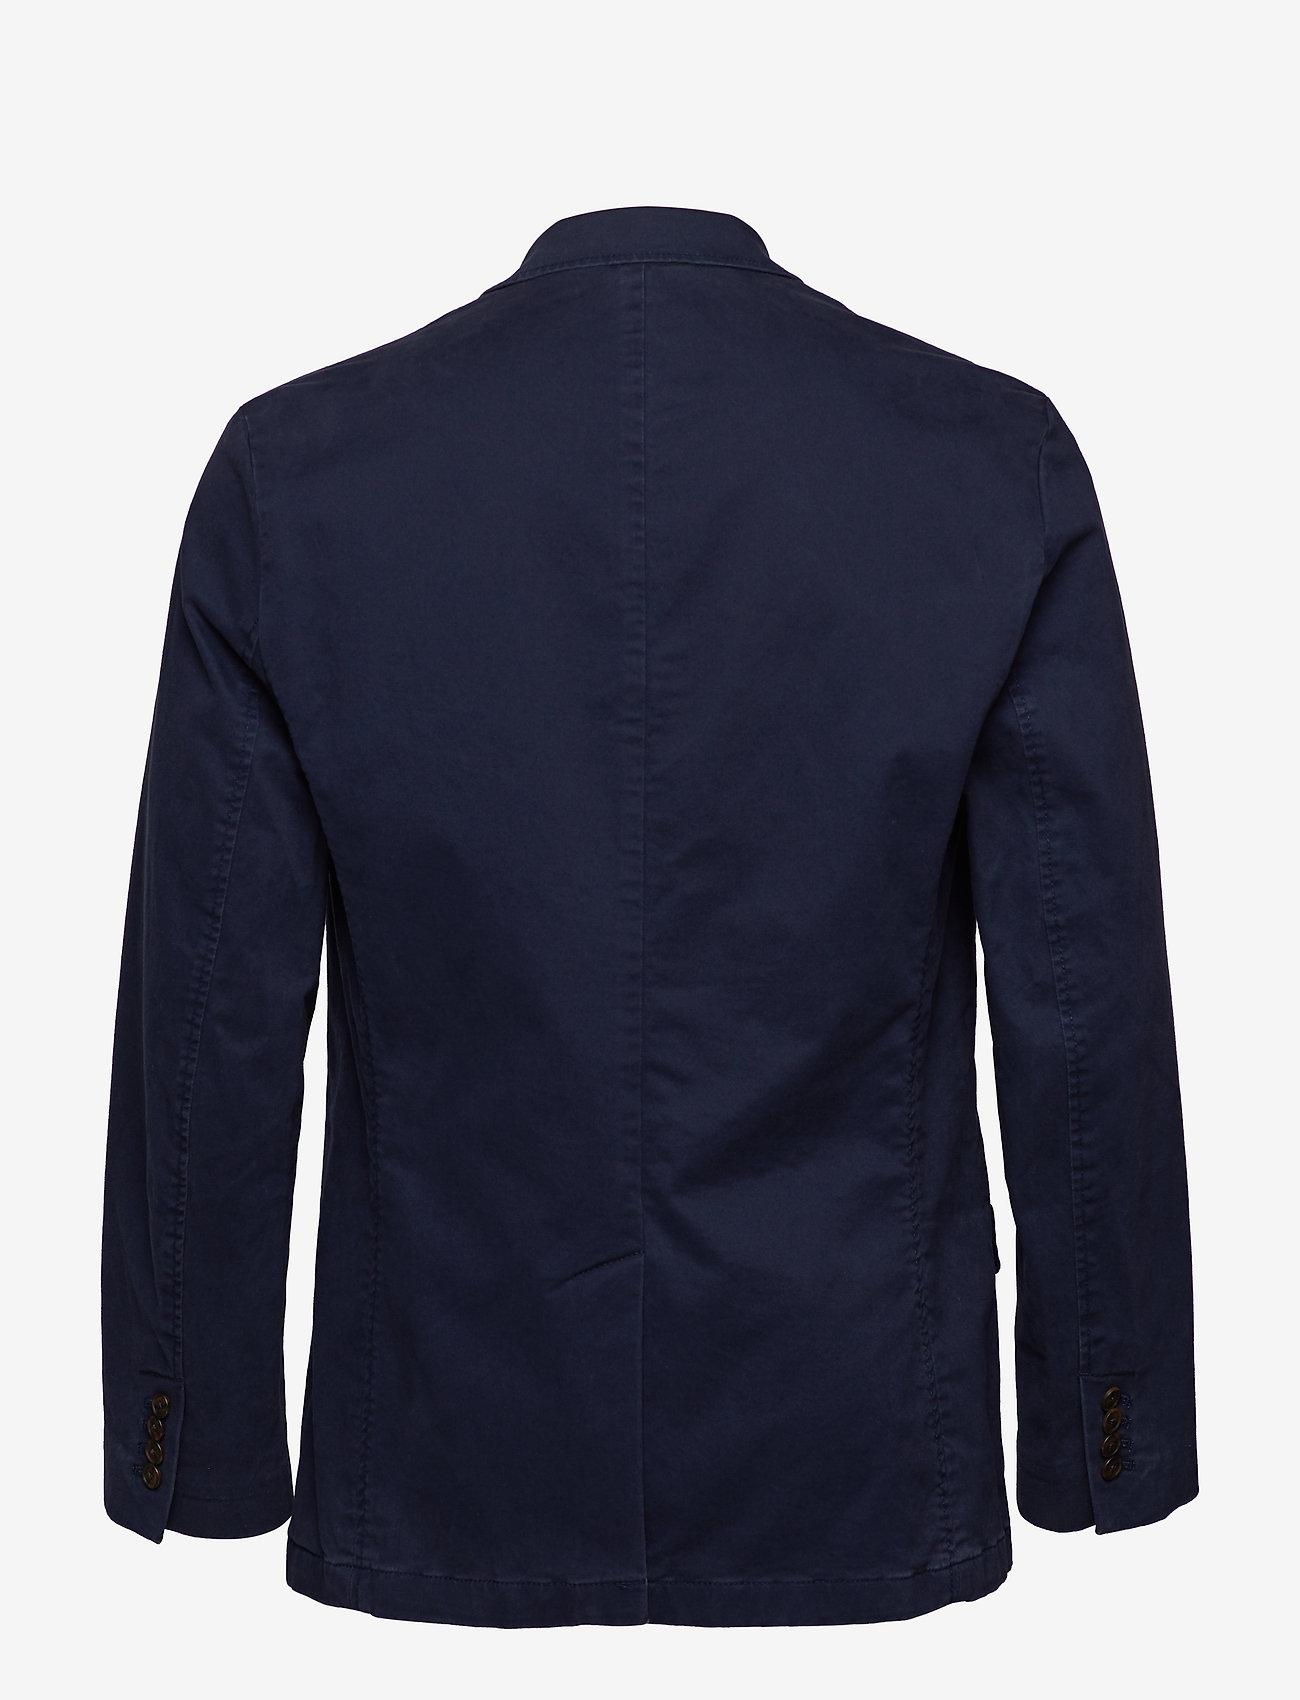 GAP Casual Classic Blazer in Stretch- Costumes & Blazers CPqHNP71 7gtSO M8XVvqRD